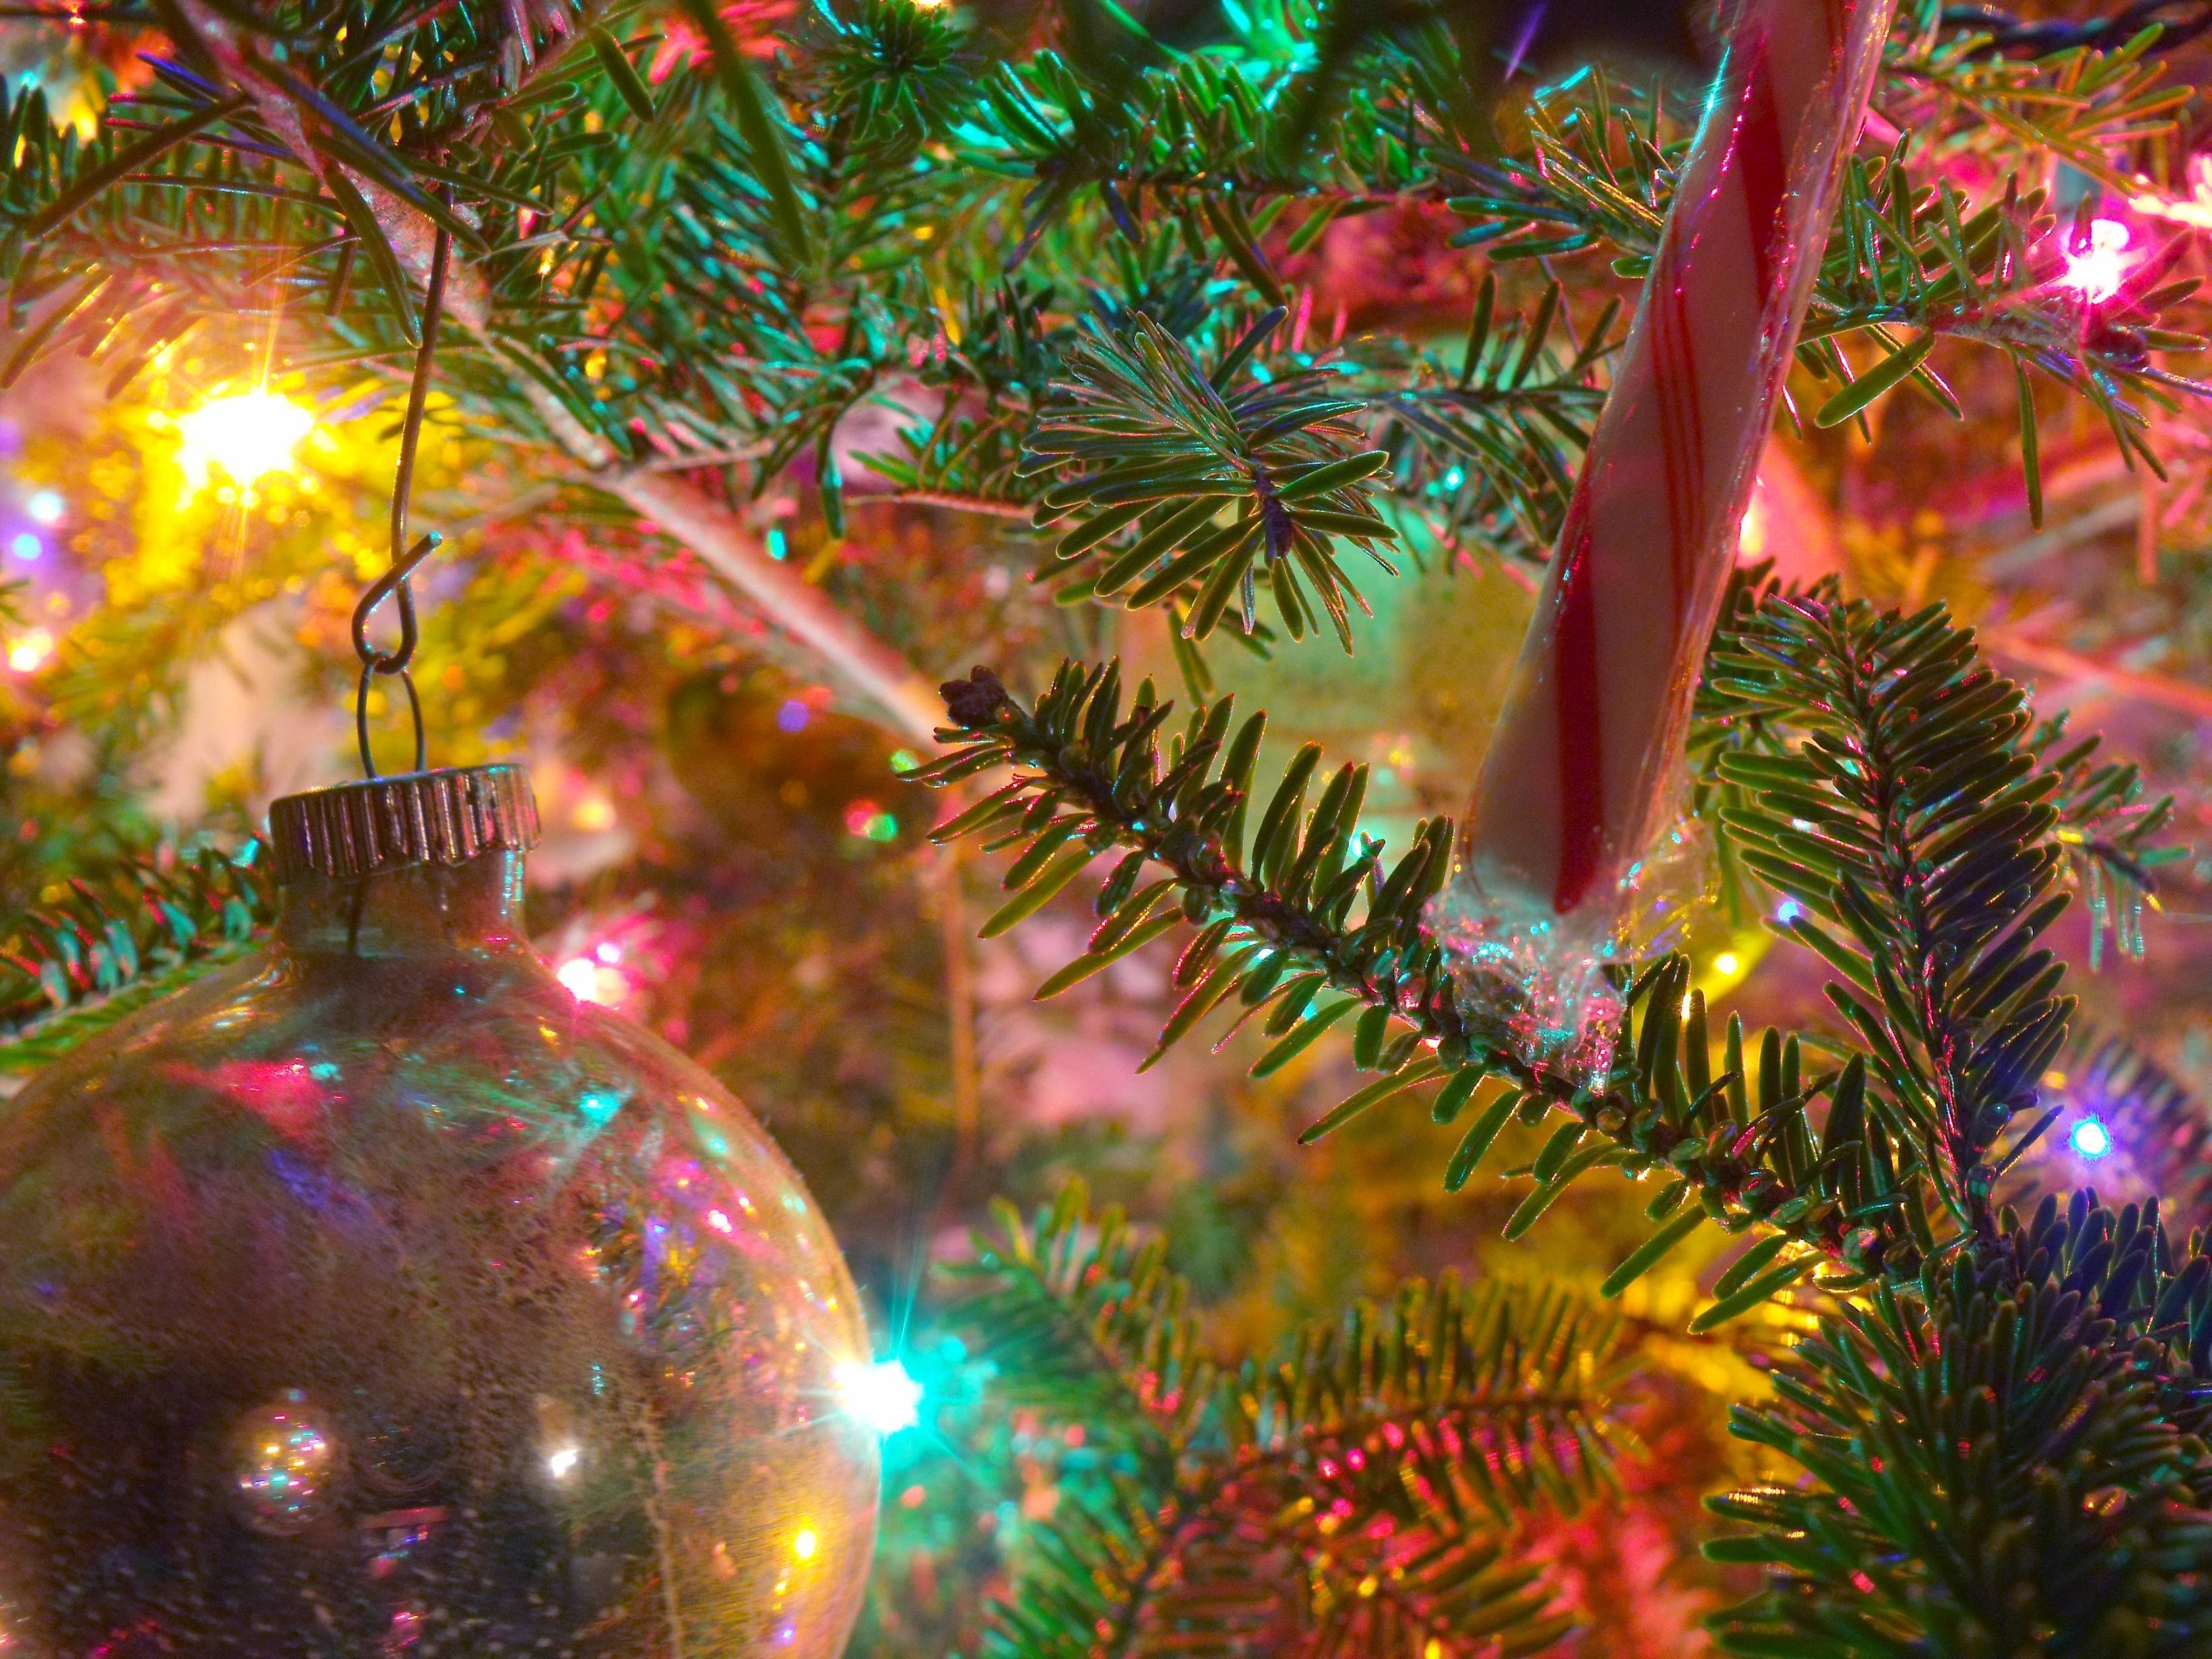 Christmas Wallpapers For Computer Desktop 3283x2462